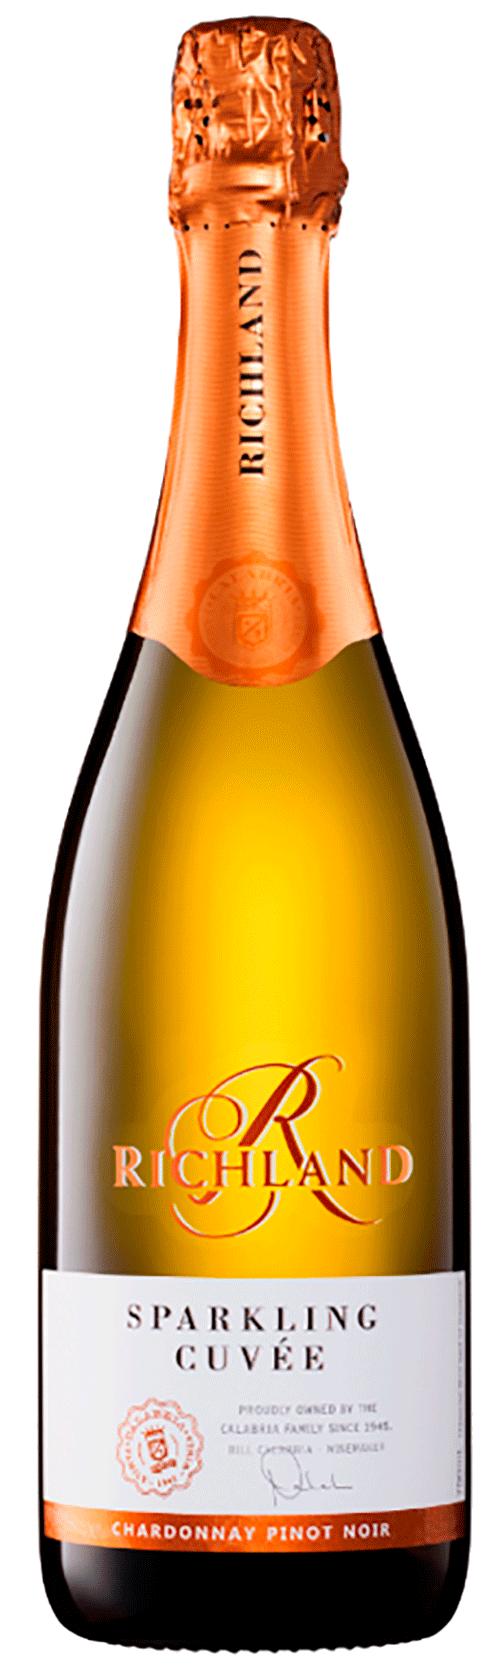 Richland Sparkling Cuvée NV